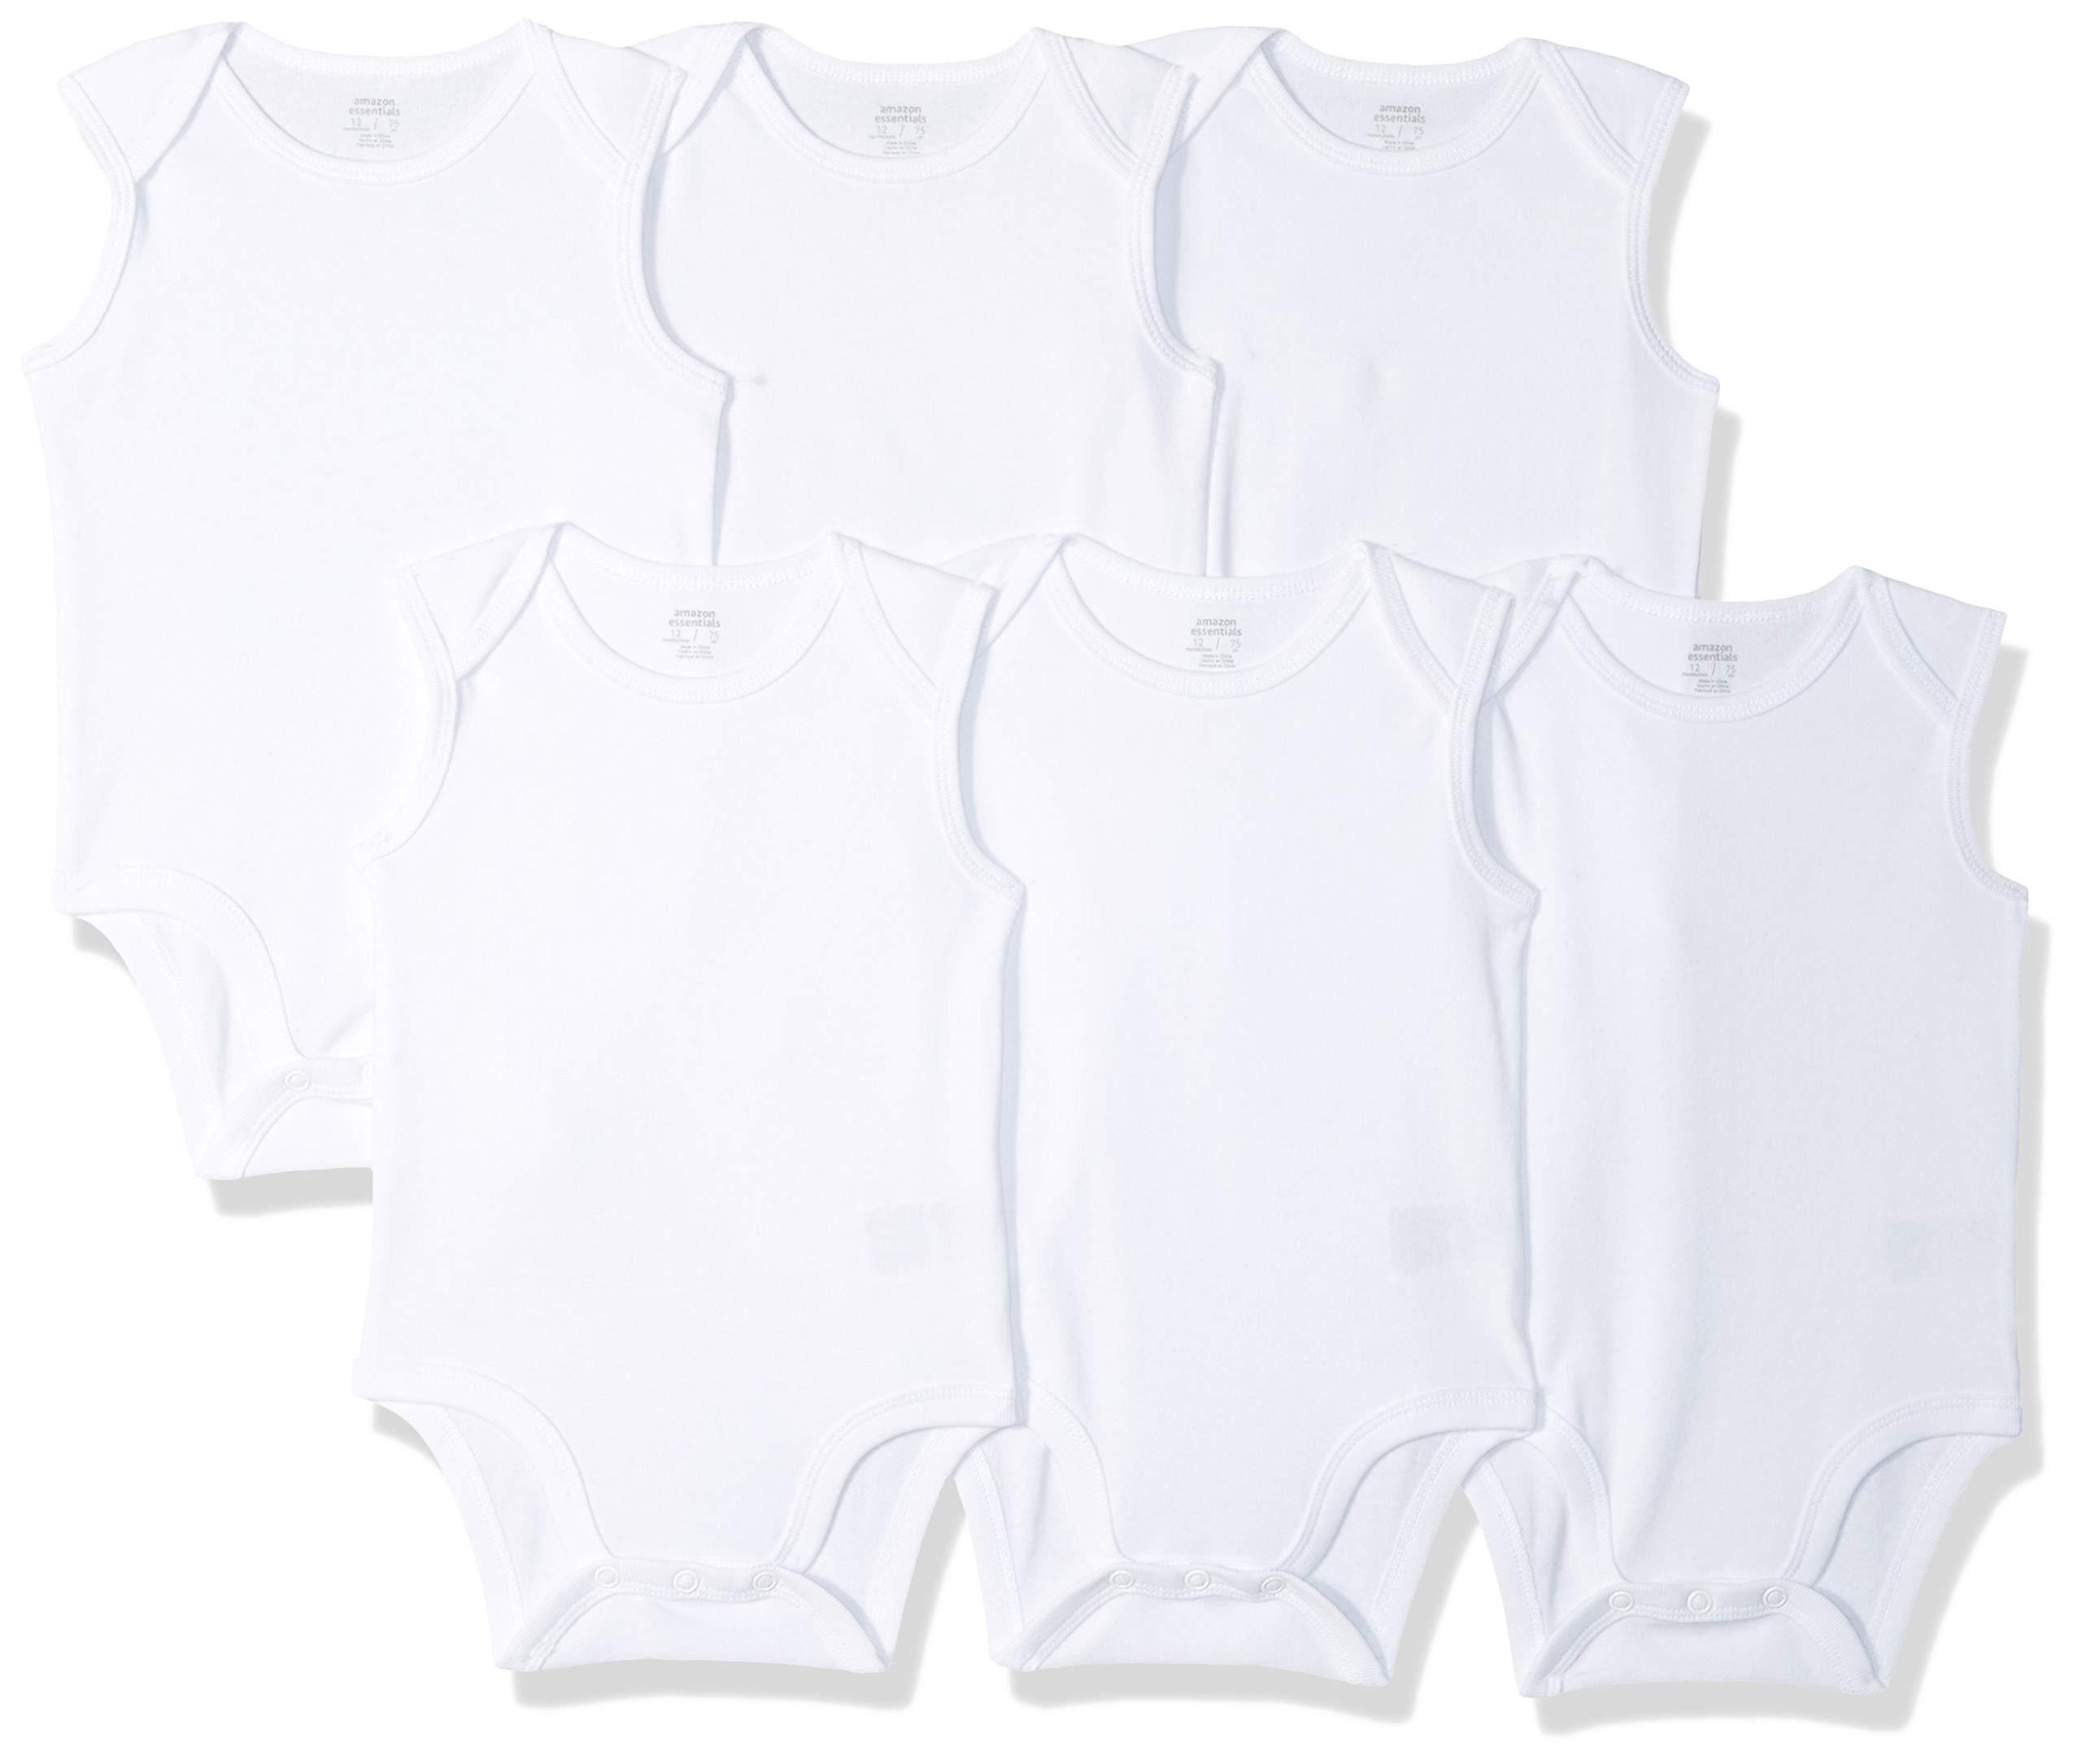 Amazon Essentials Baby 6-Pack Sleeveless Bodysuits, Solid White, 3-6M by Amazon Essentials